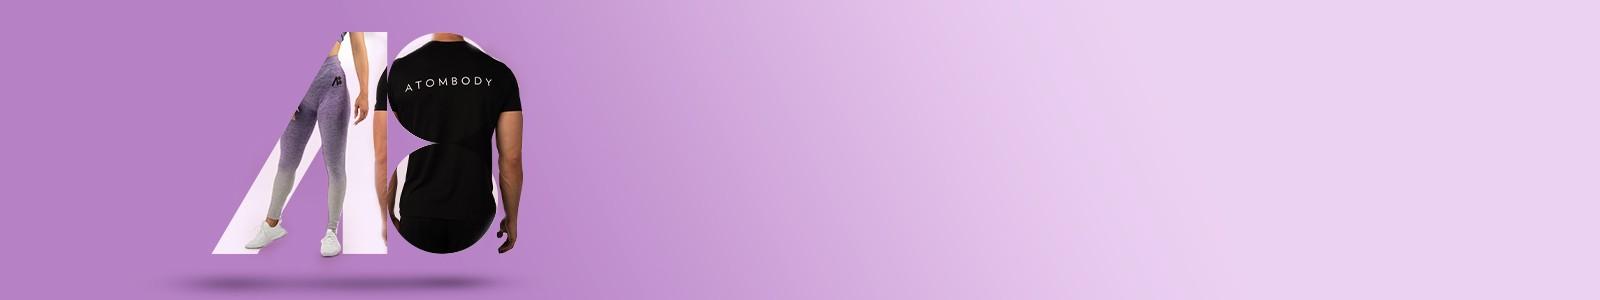 2019_7_8_atombody_kategoriebanner_1600x300px_sportbekleidung